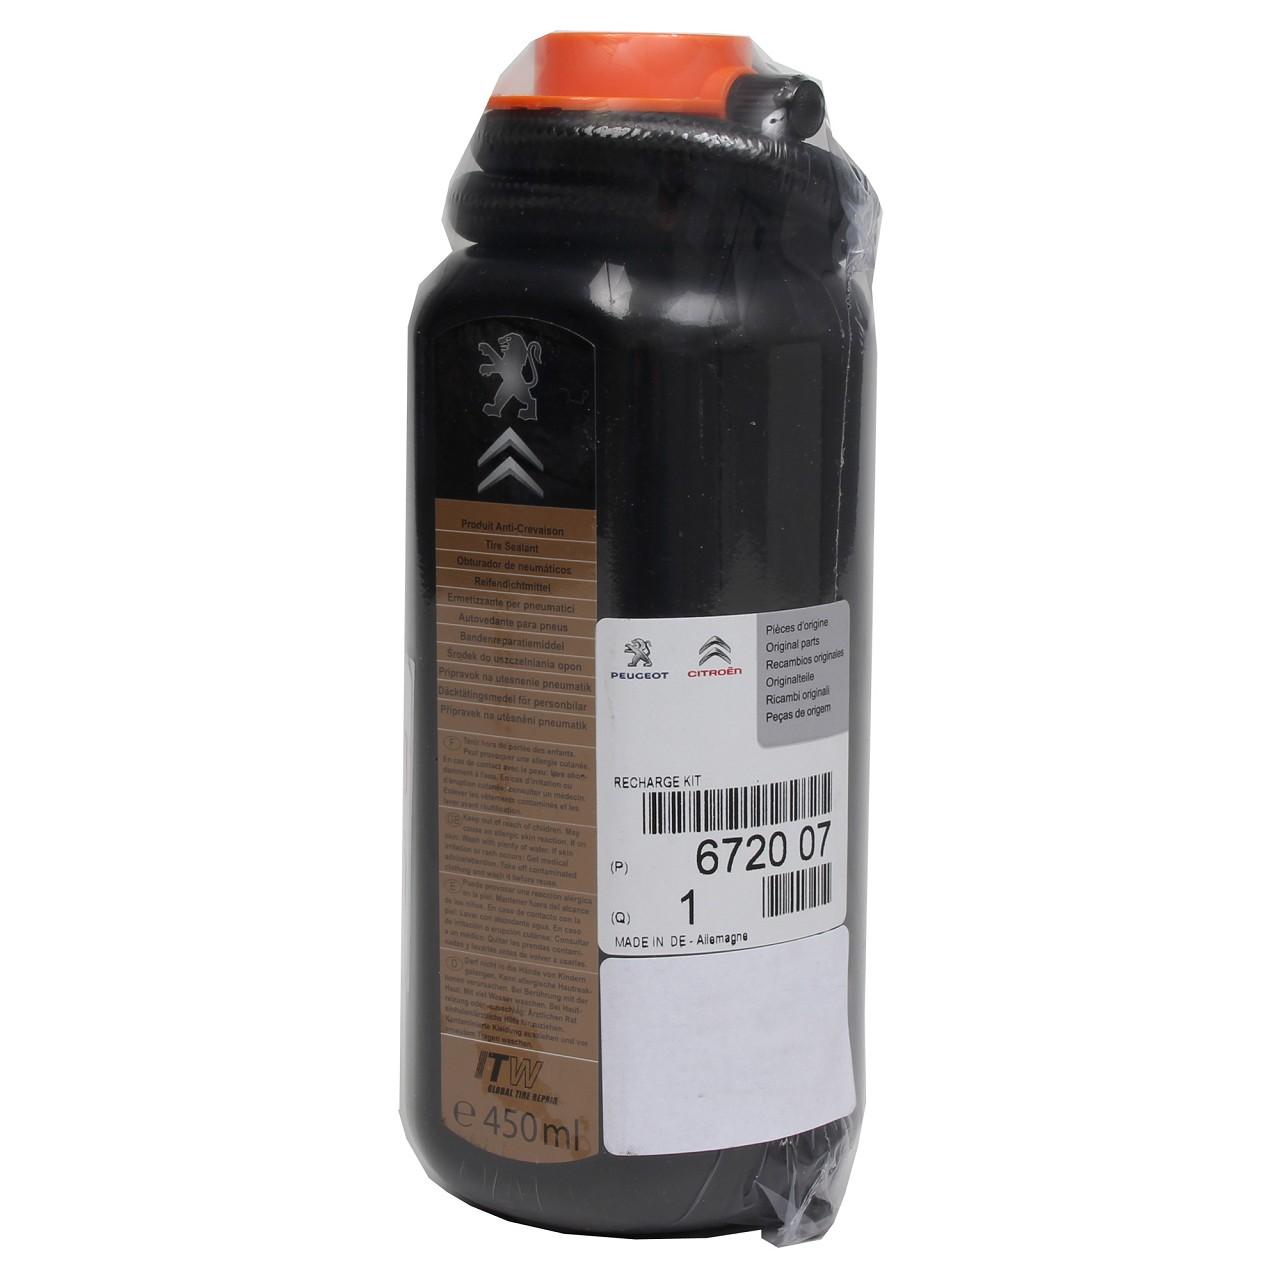 ORIGINAL Citroen Peugeot Reifendichtmittel Reifendichtungsmittel 450ml 6720.07